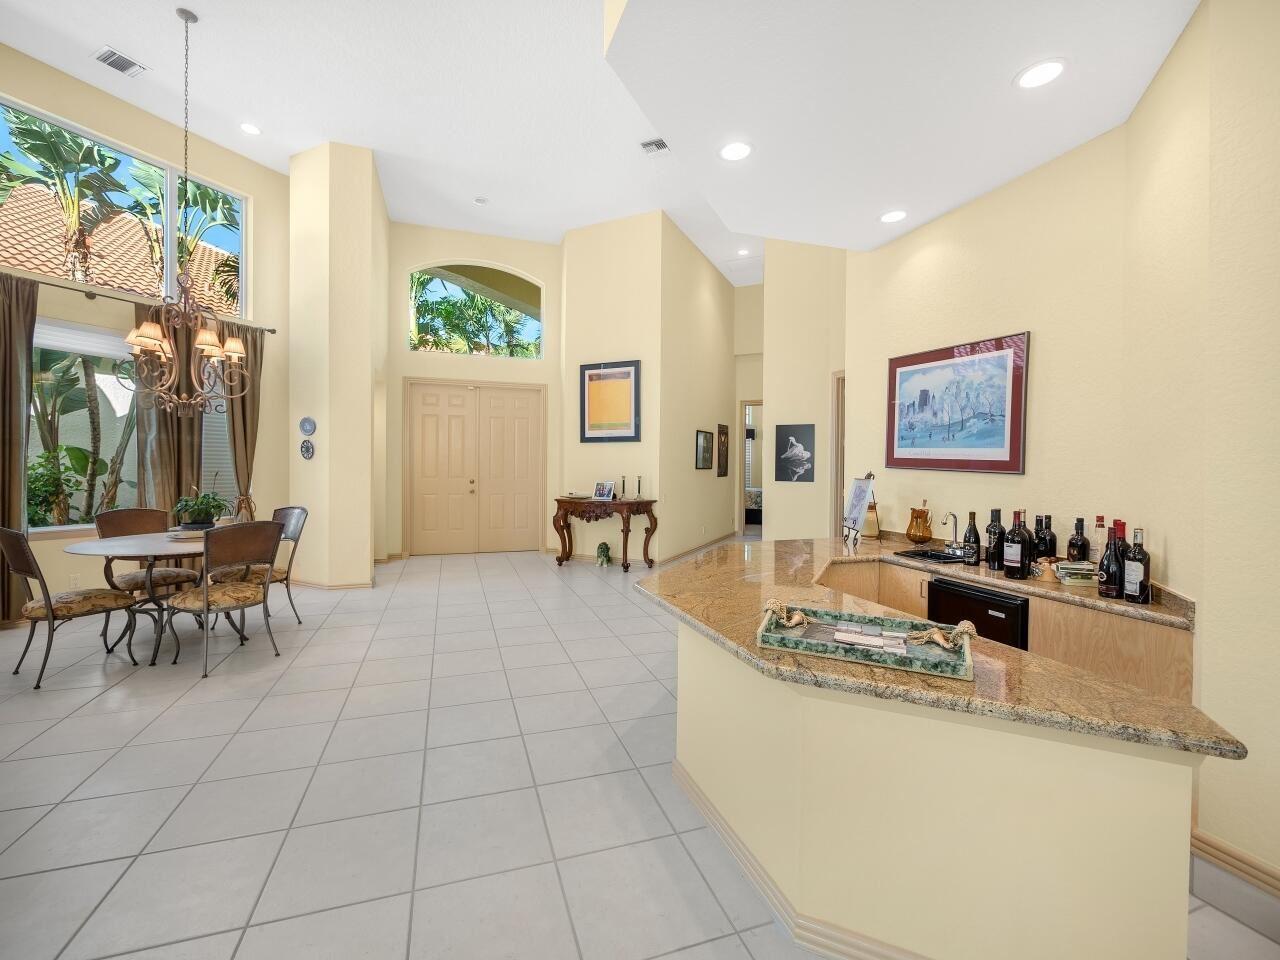 Photo of 152 Windward Drive, Palm Beach Gardens, FL 33418 (MLS # RX-10707072)